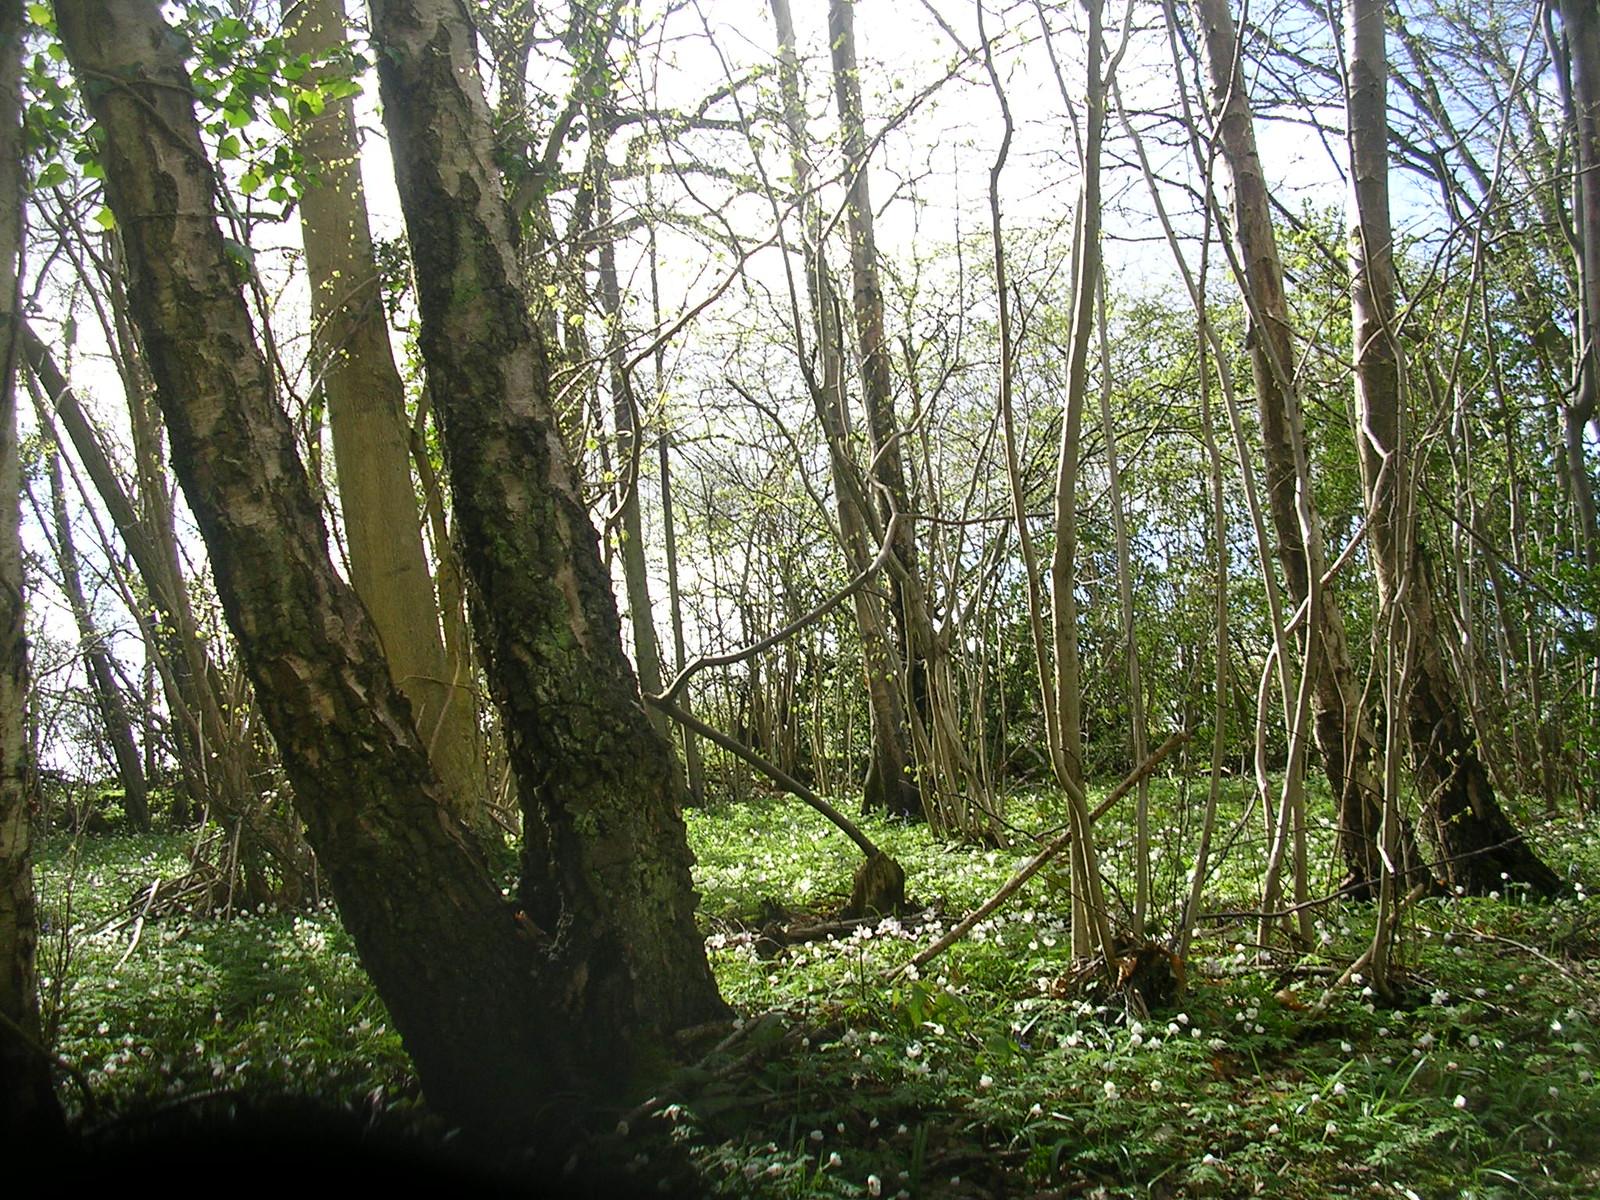 Anenome wood Robertsbridge to Battle